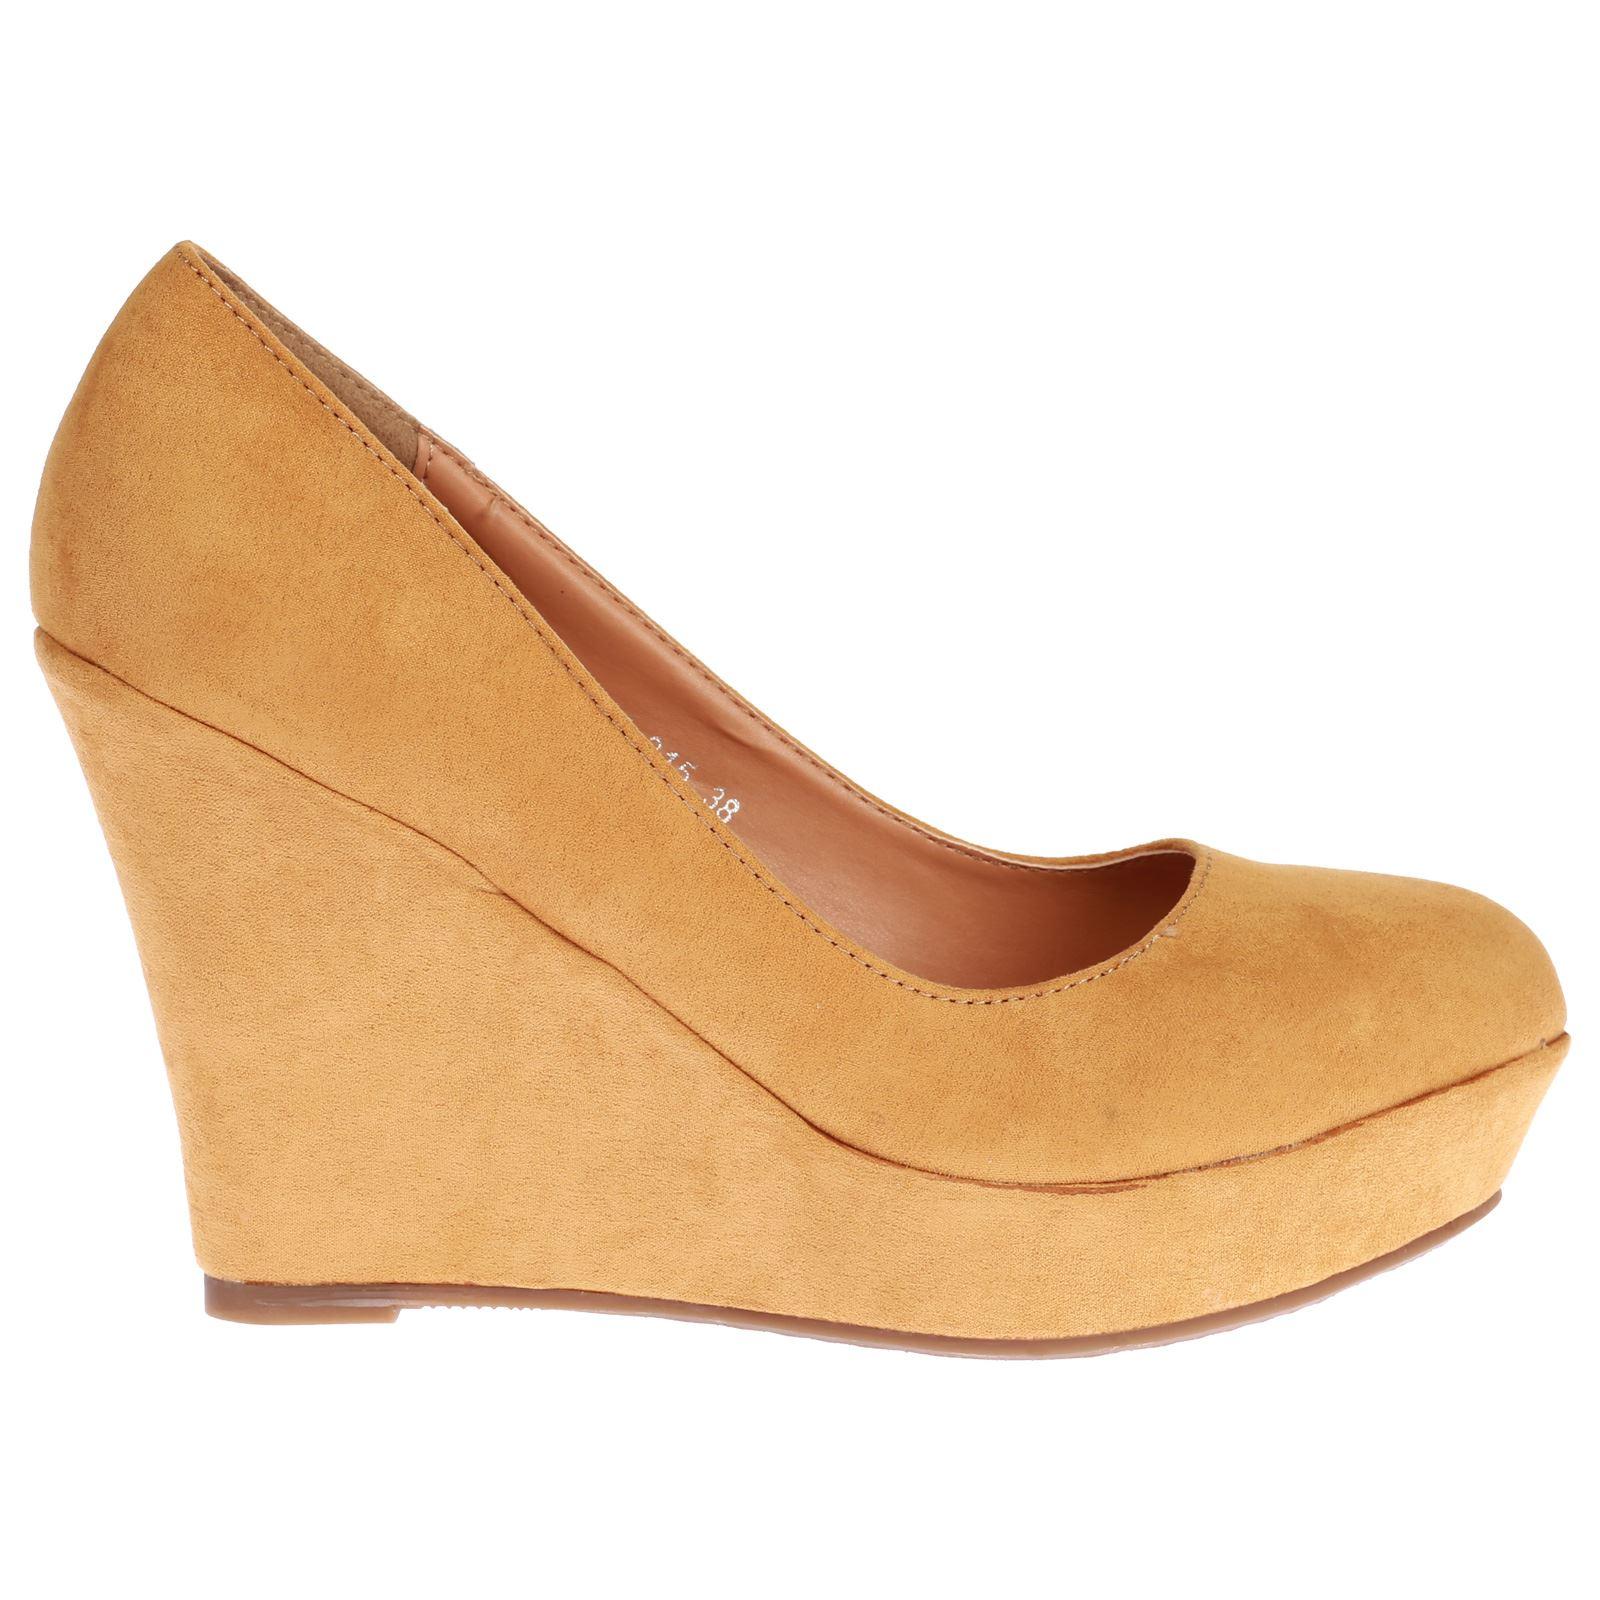 womens shoes high heels wedges court smart